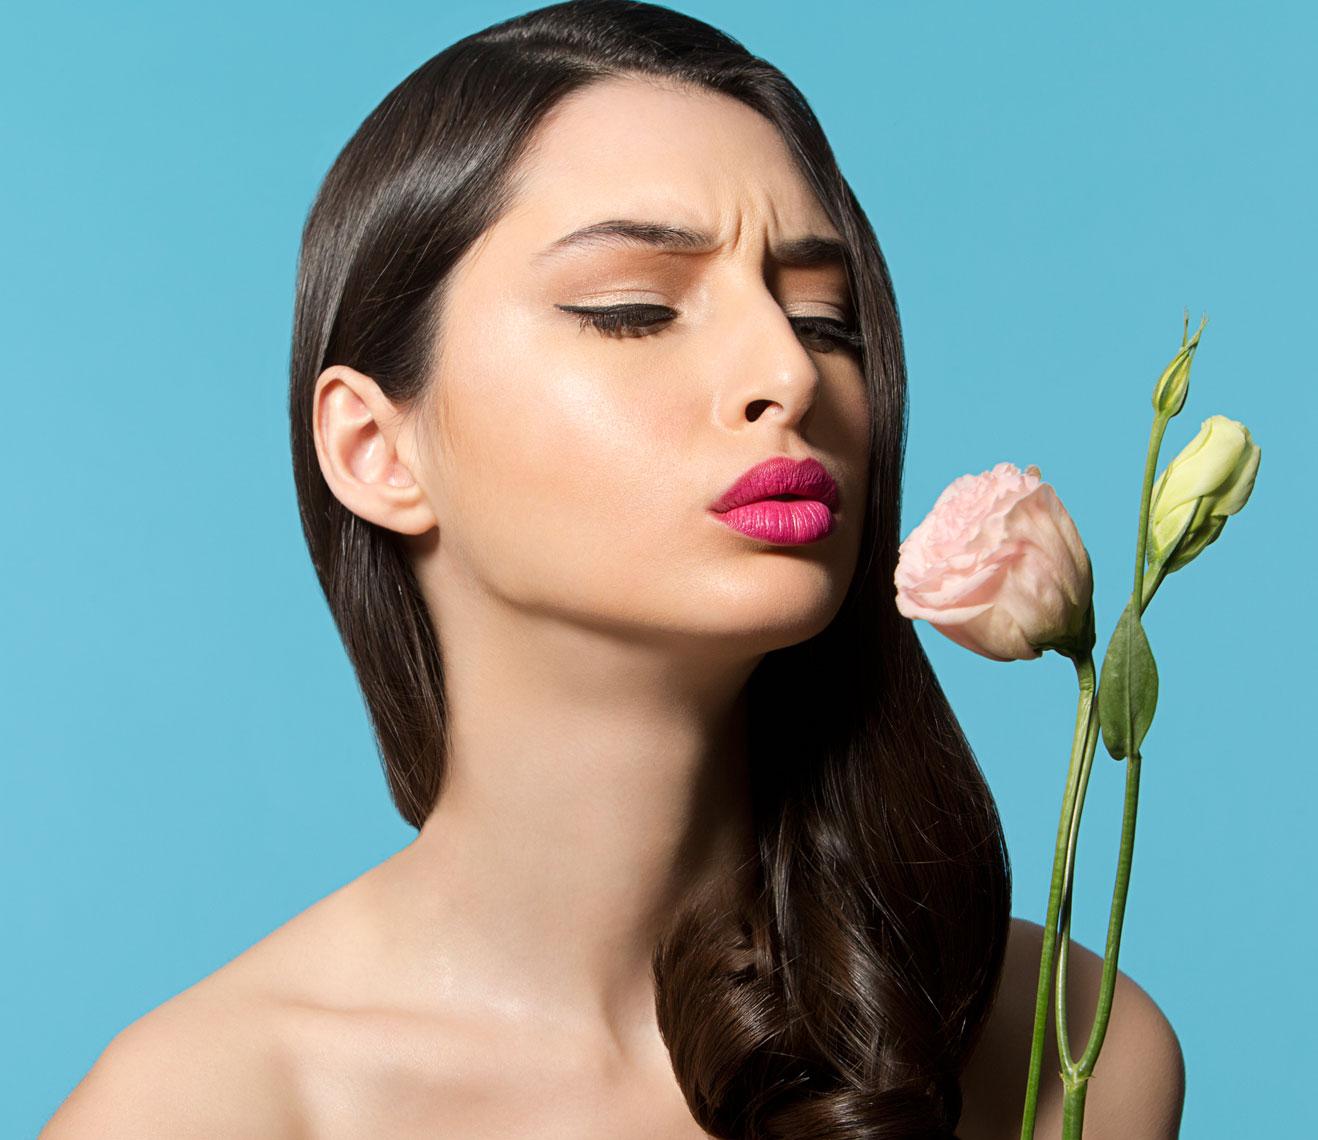 Eric-Hason-Fashion-Beauty-Photographer-New-York